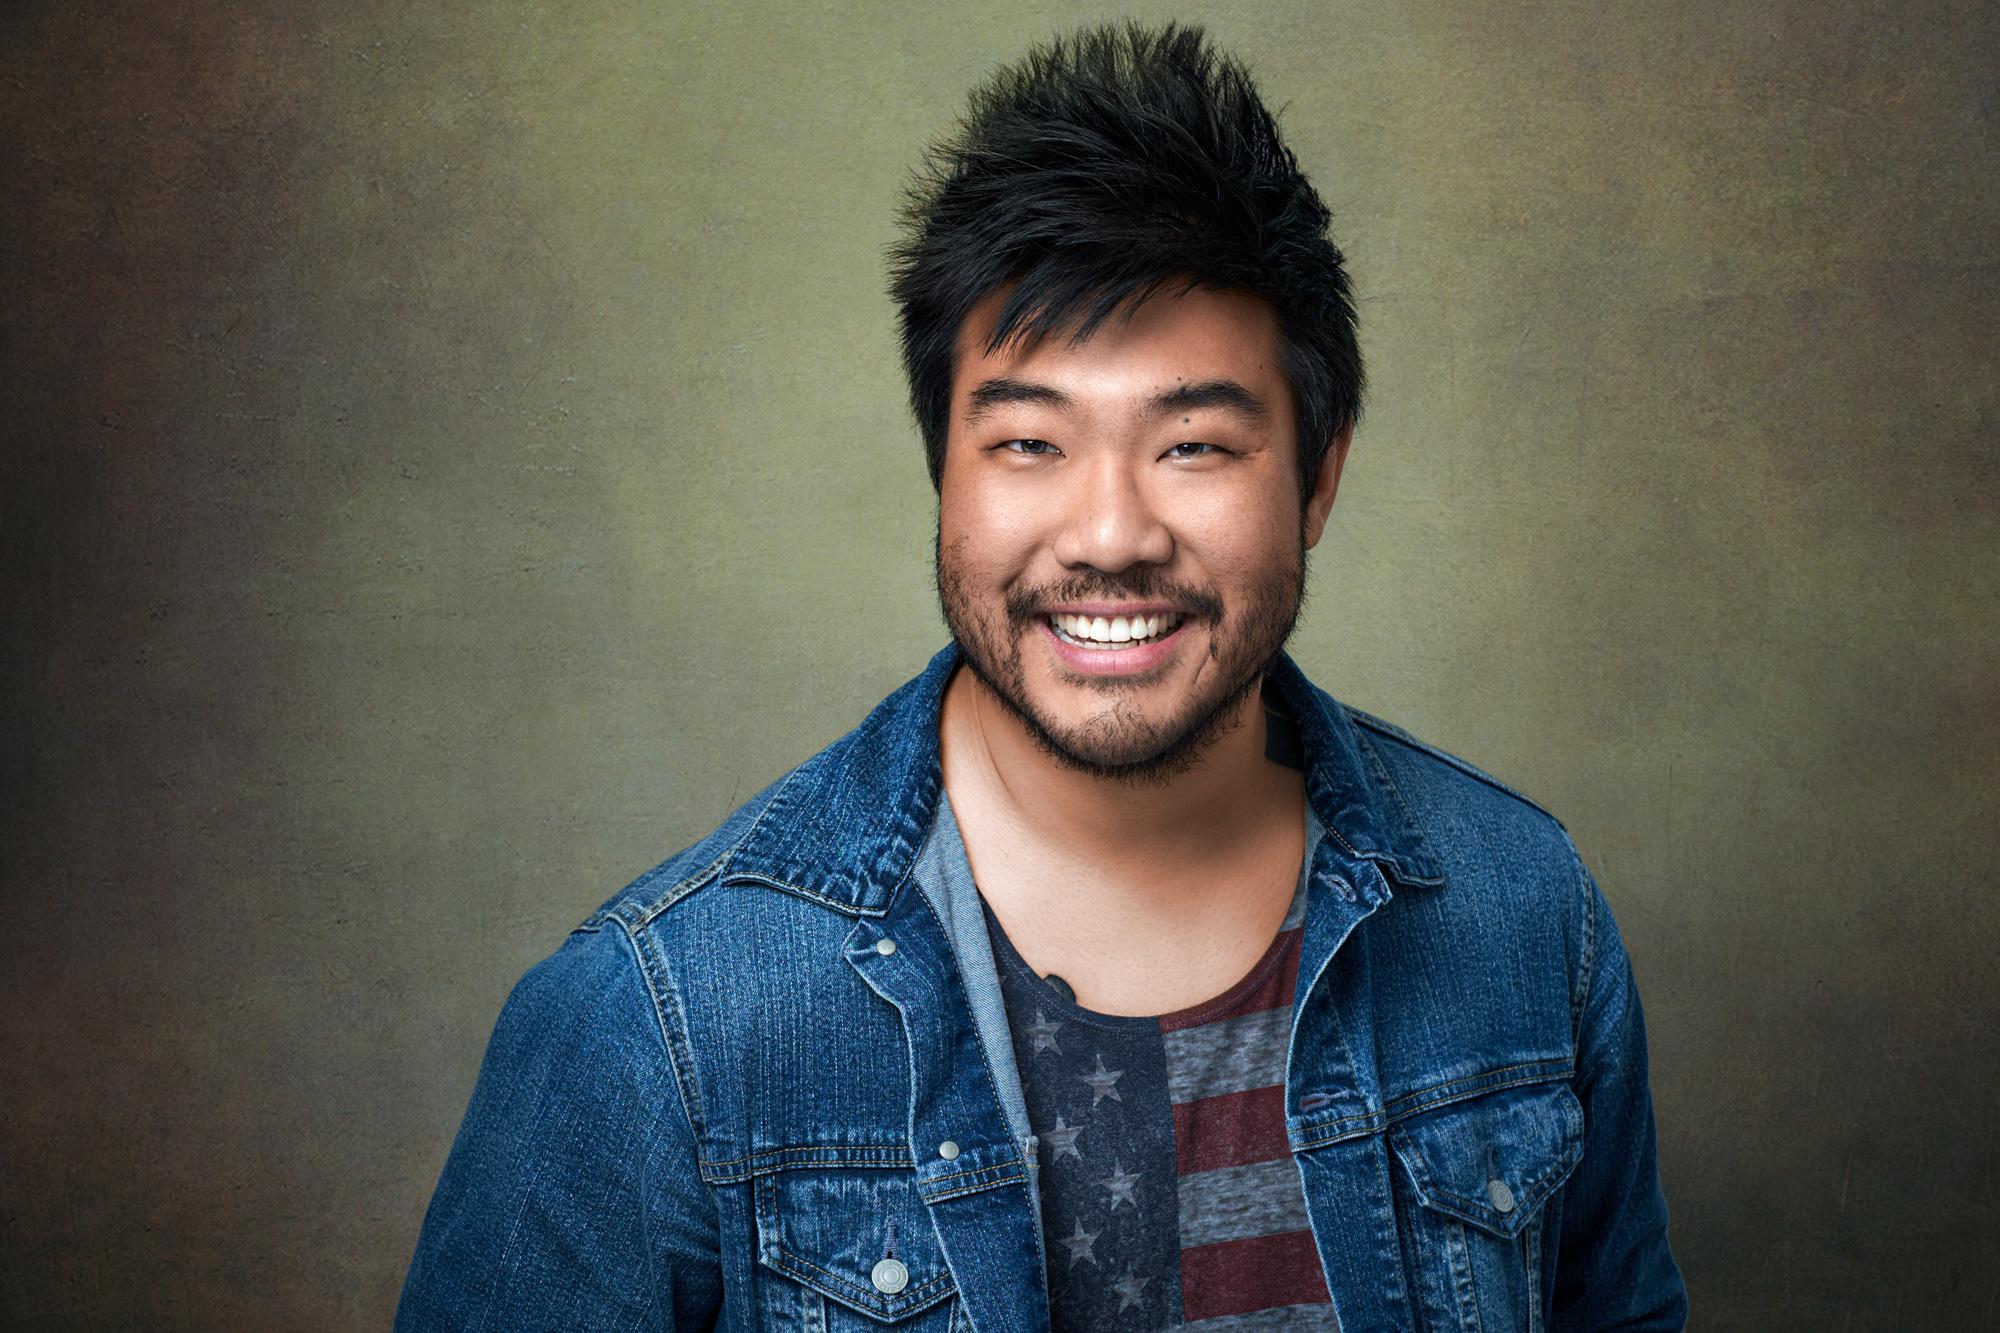 Professional Headshot Smiling Gold shirt